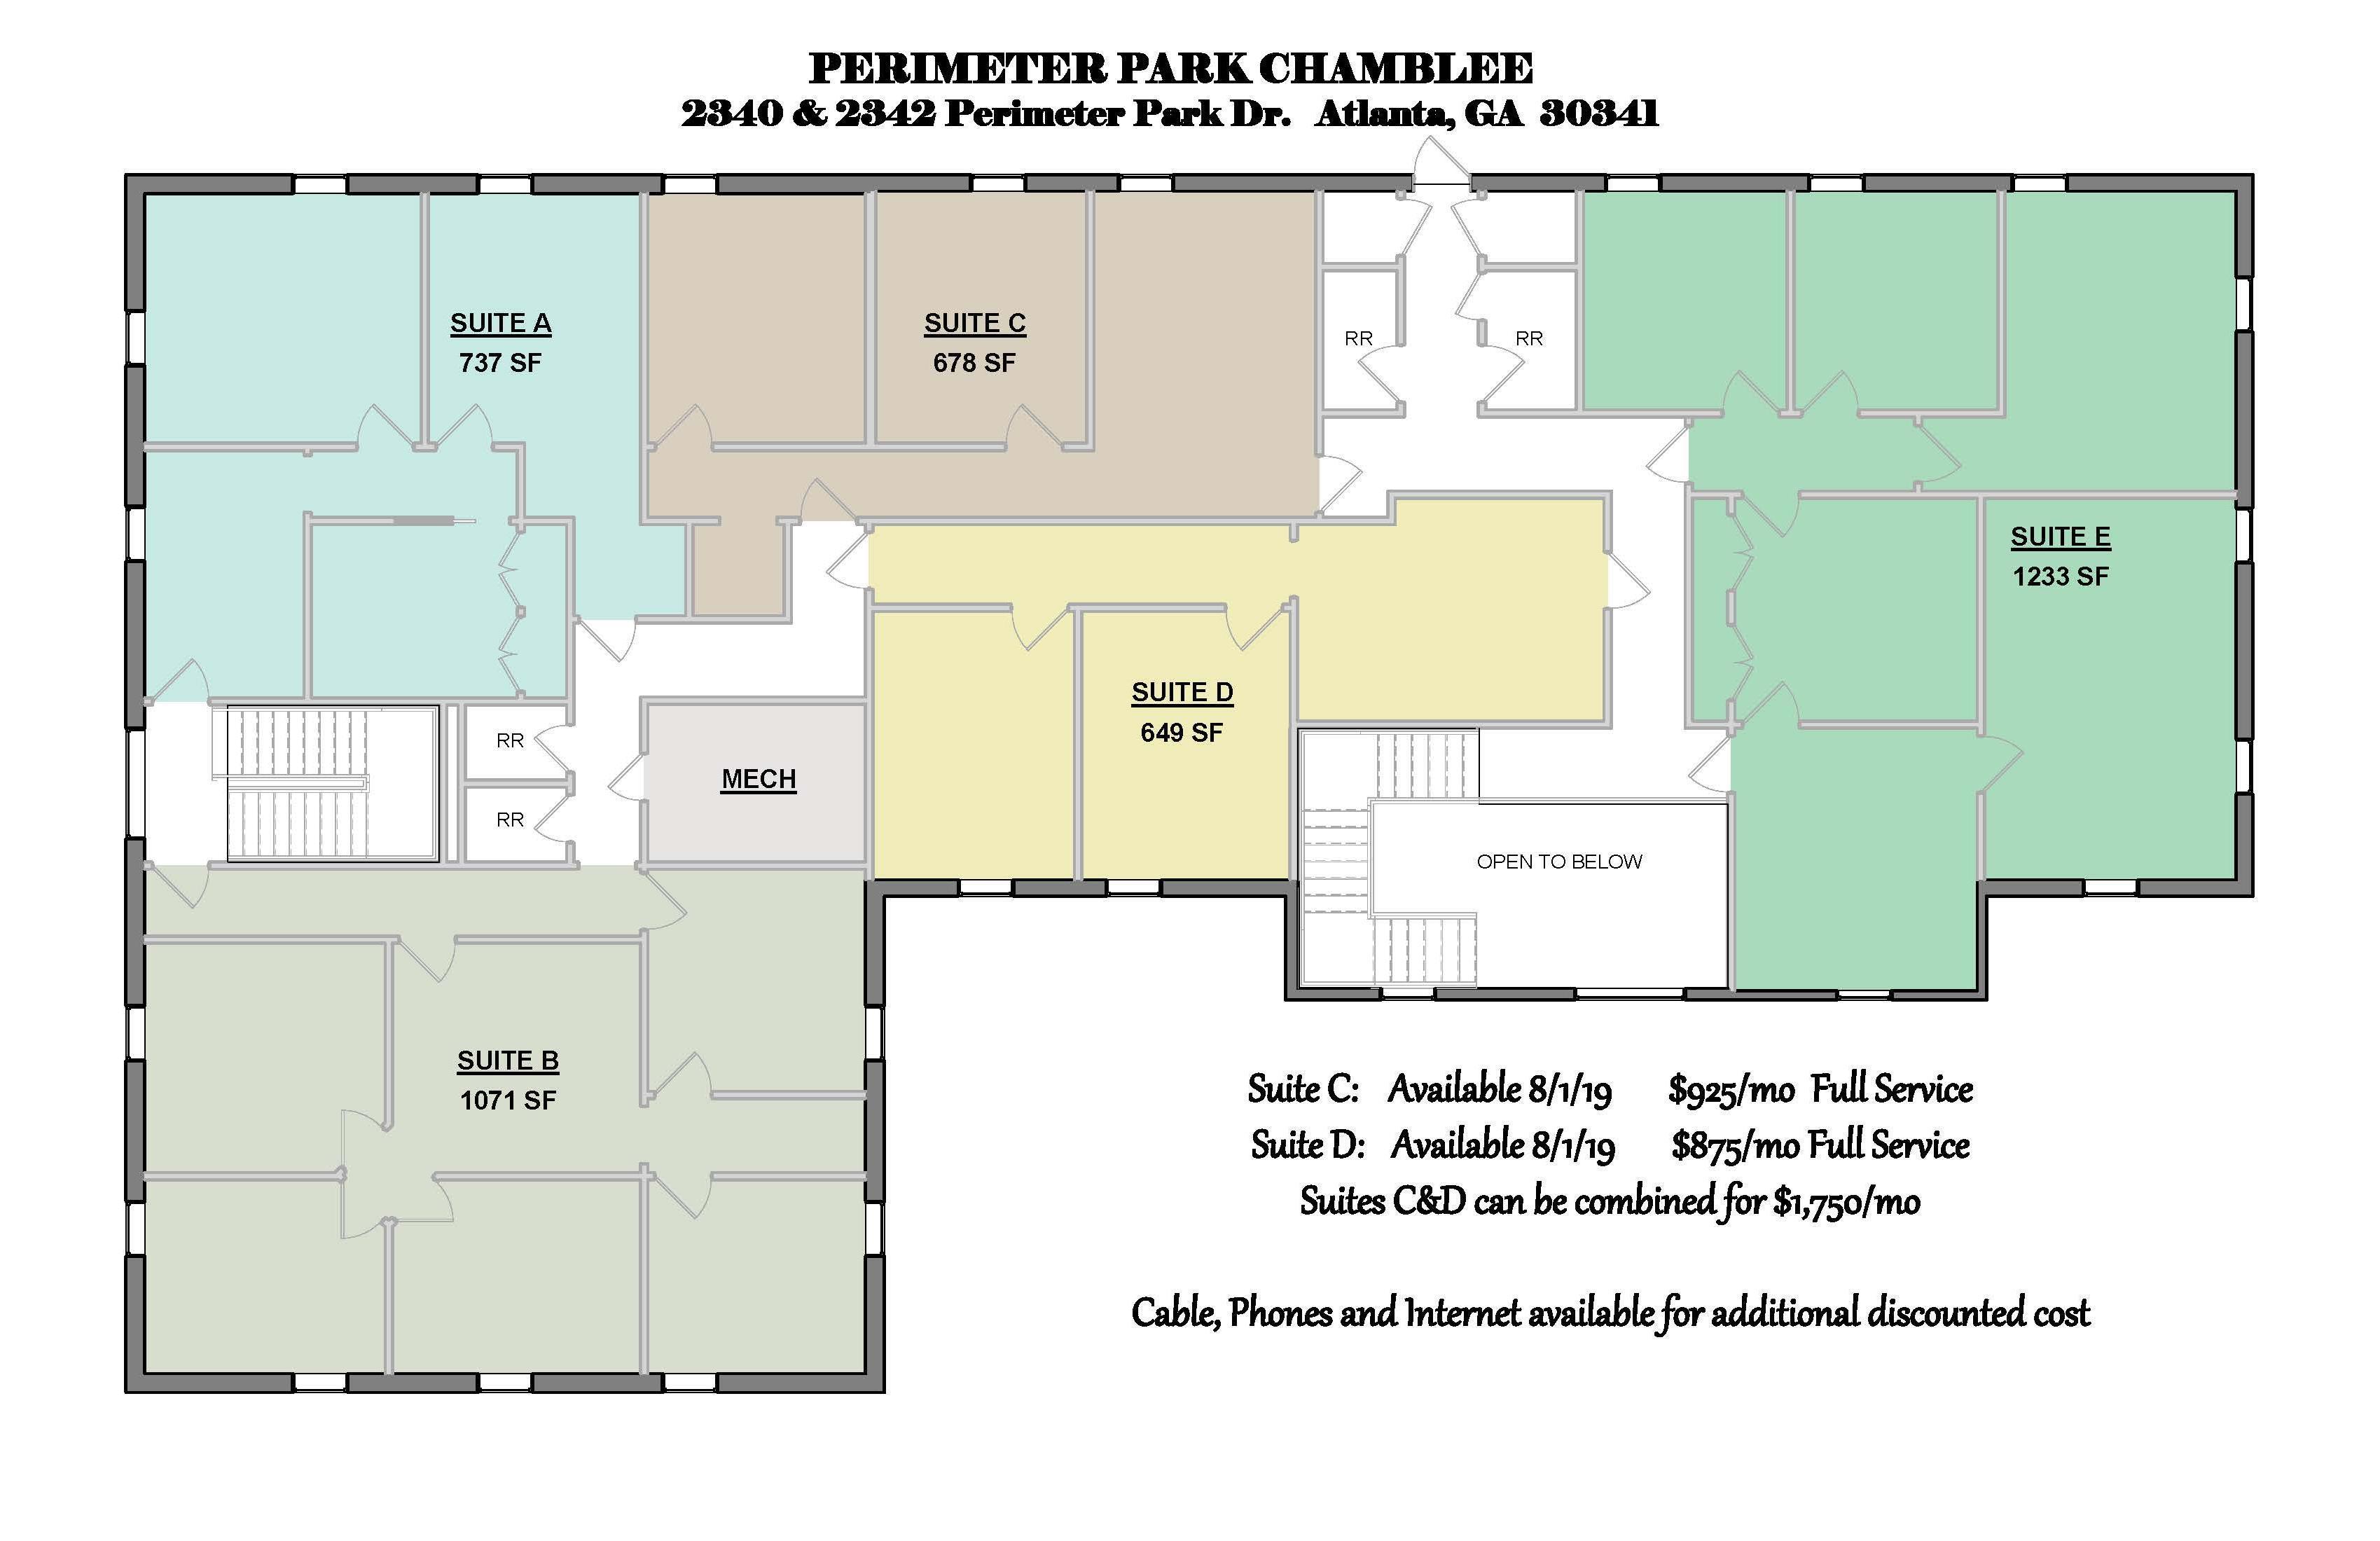 Logo of Perimeter Park Chamblee